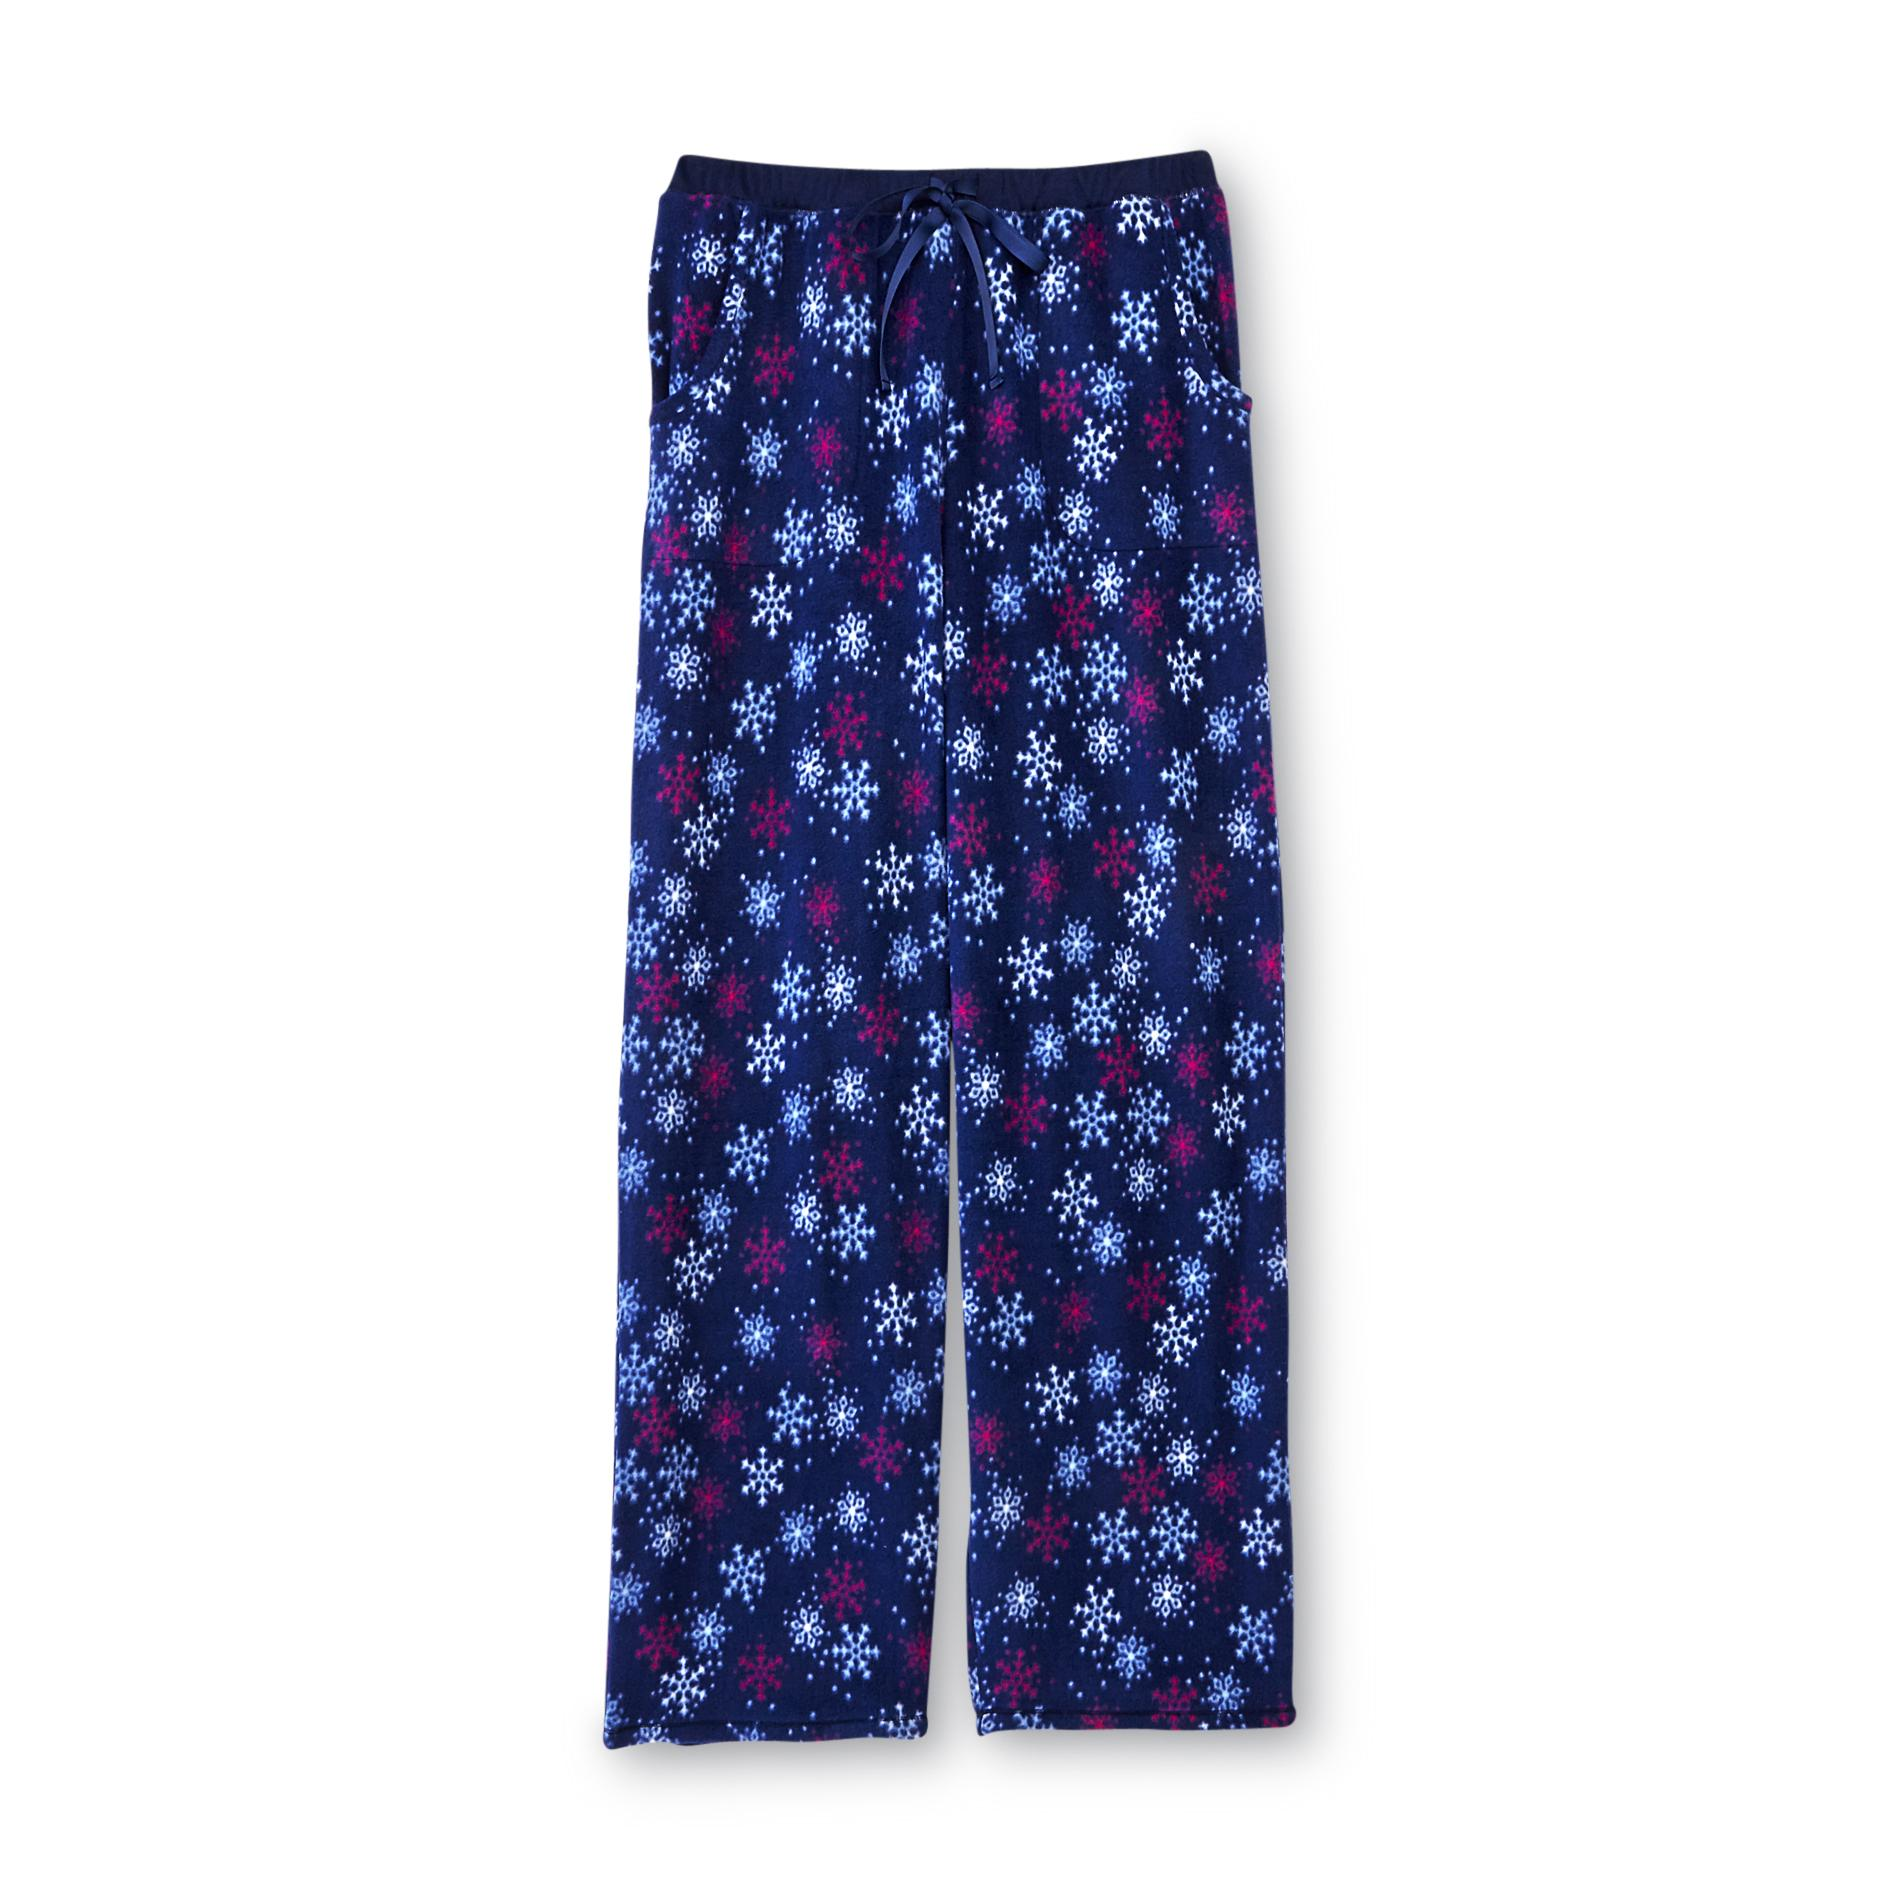 Jaclyn Intimates Women' Super Span Stretch Fleece Pajama Pants - Snowflake